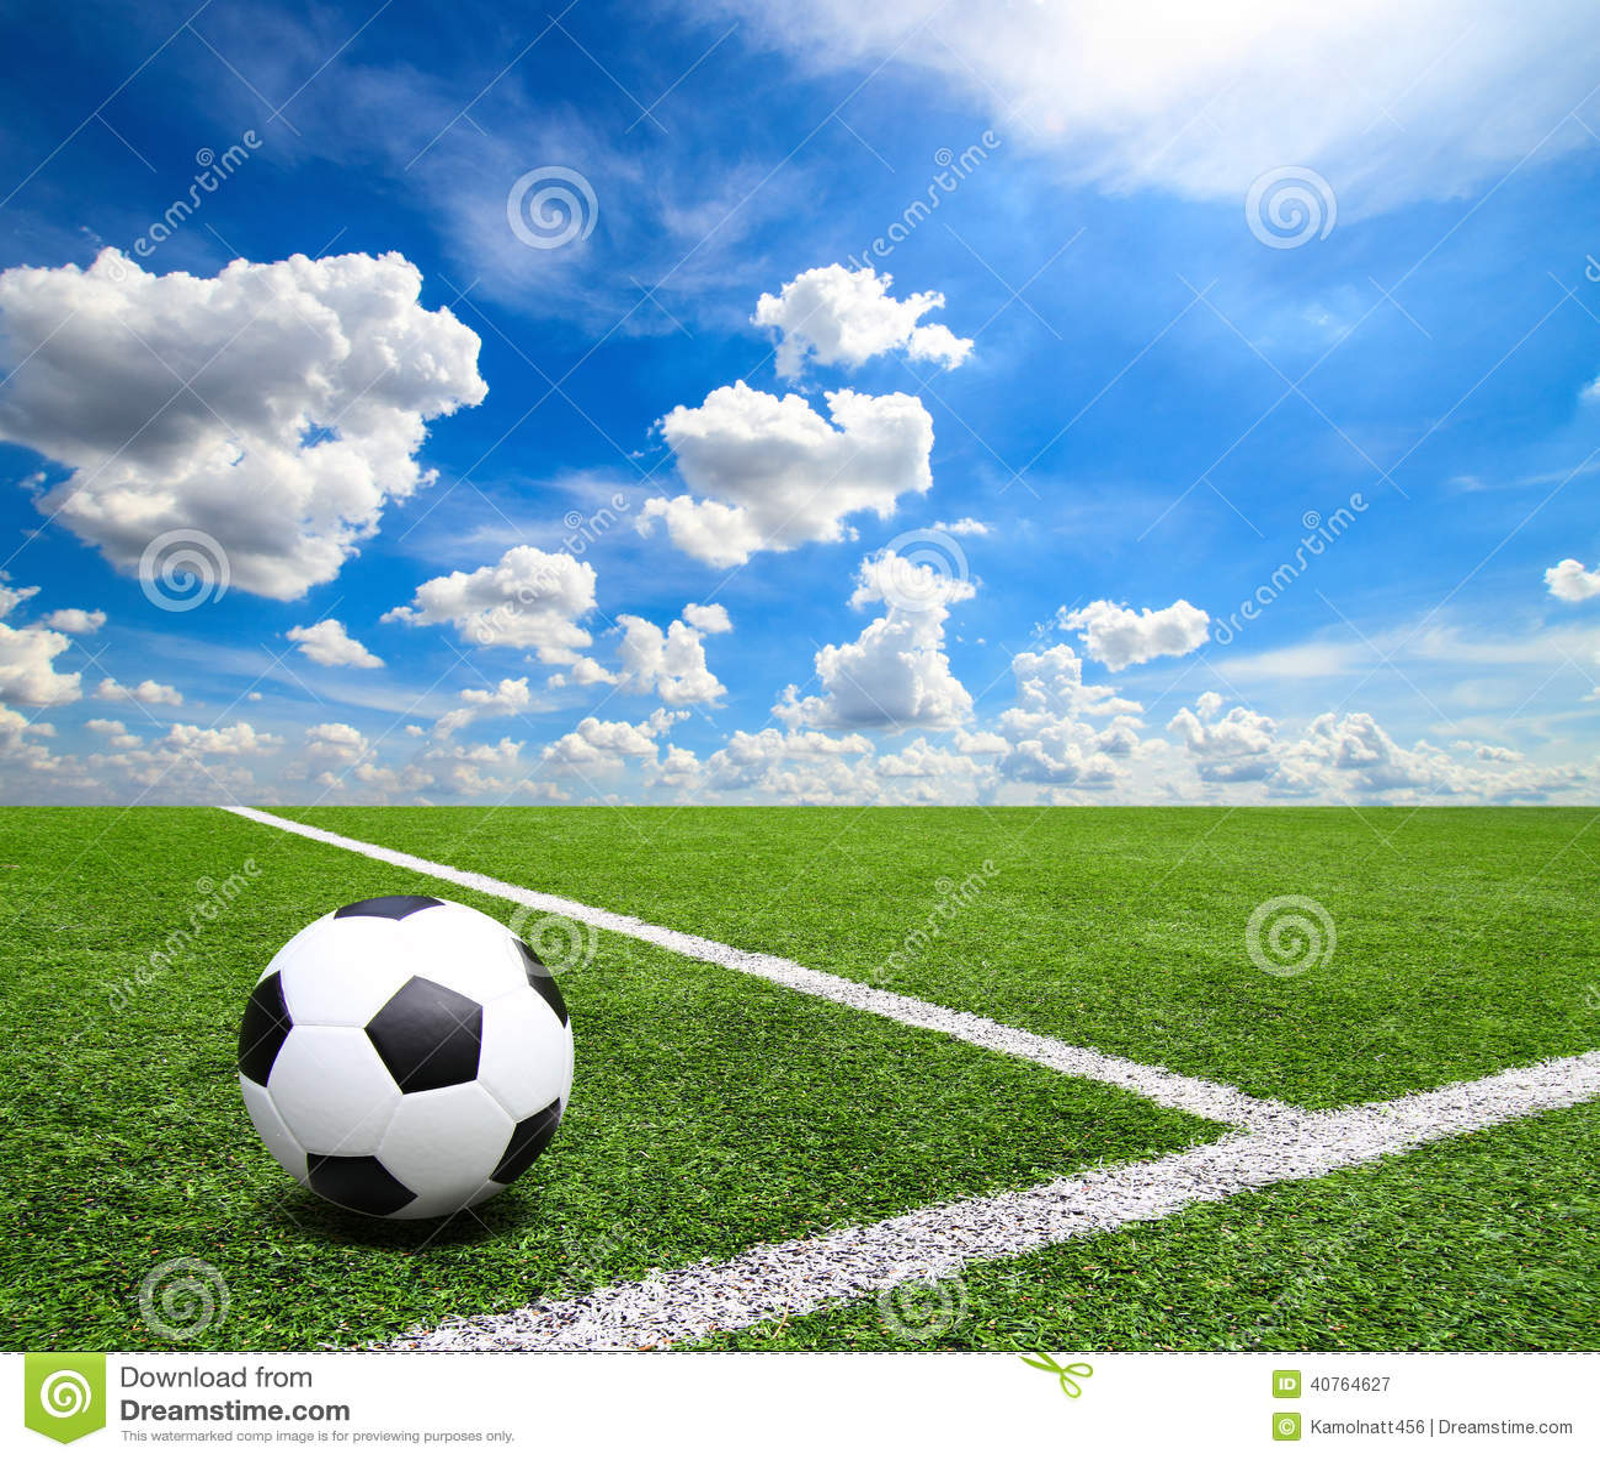 Fanmats Seattle Seahawks 3 Ft X 6 Ft Football Field: Football And Soccer Field Grass Stadium Blue Sky